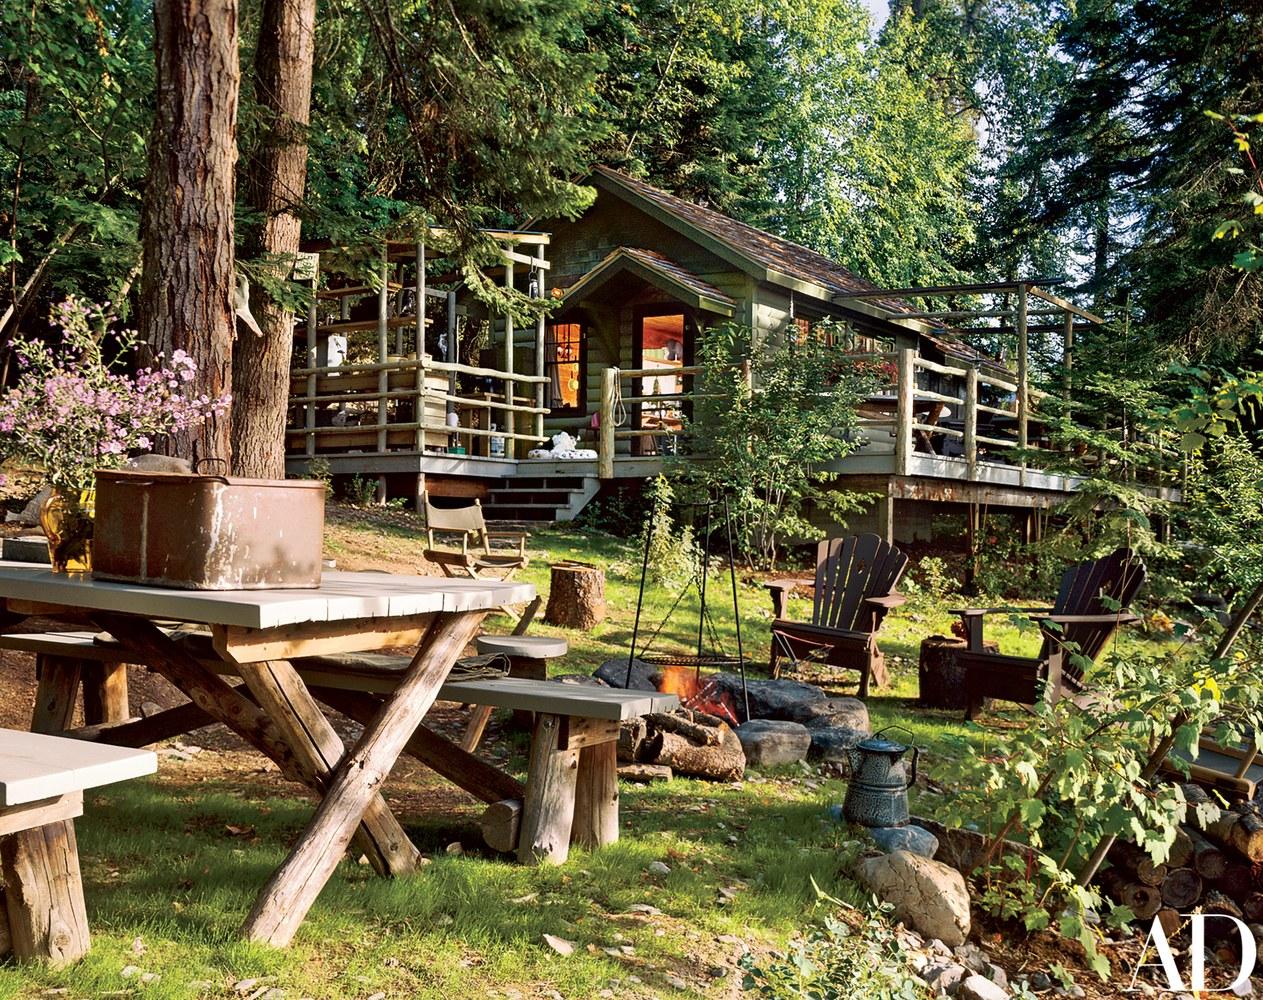 A rustic cabin on Lake Michigan by Mimi London | photos by  David O. Marlow